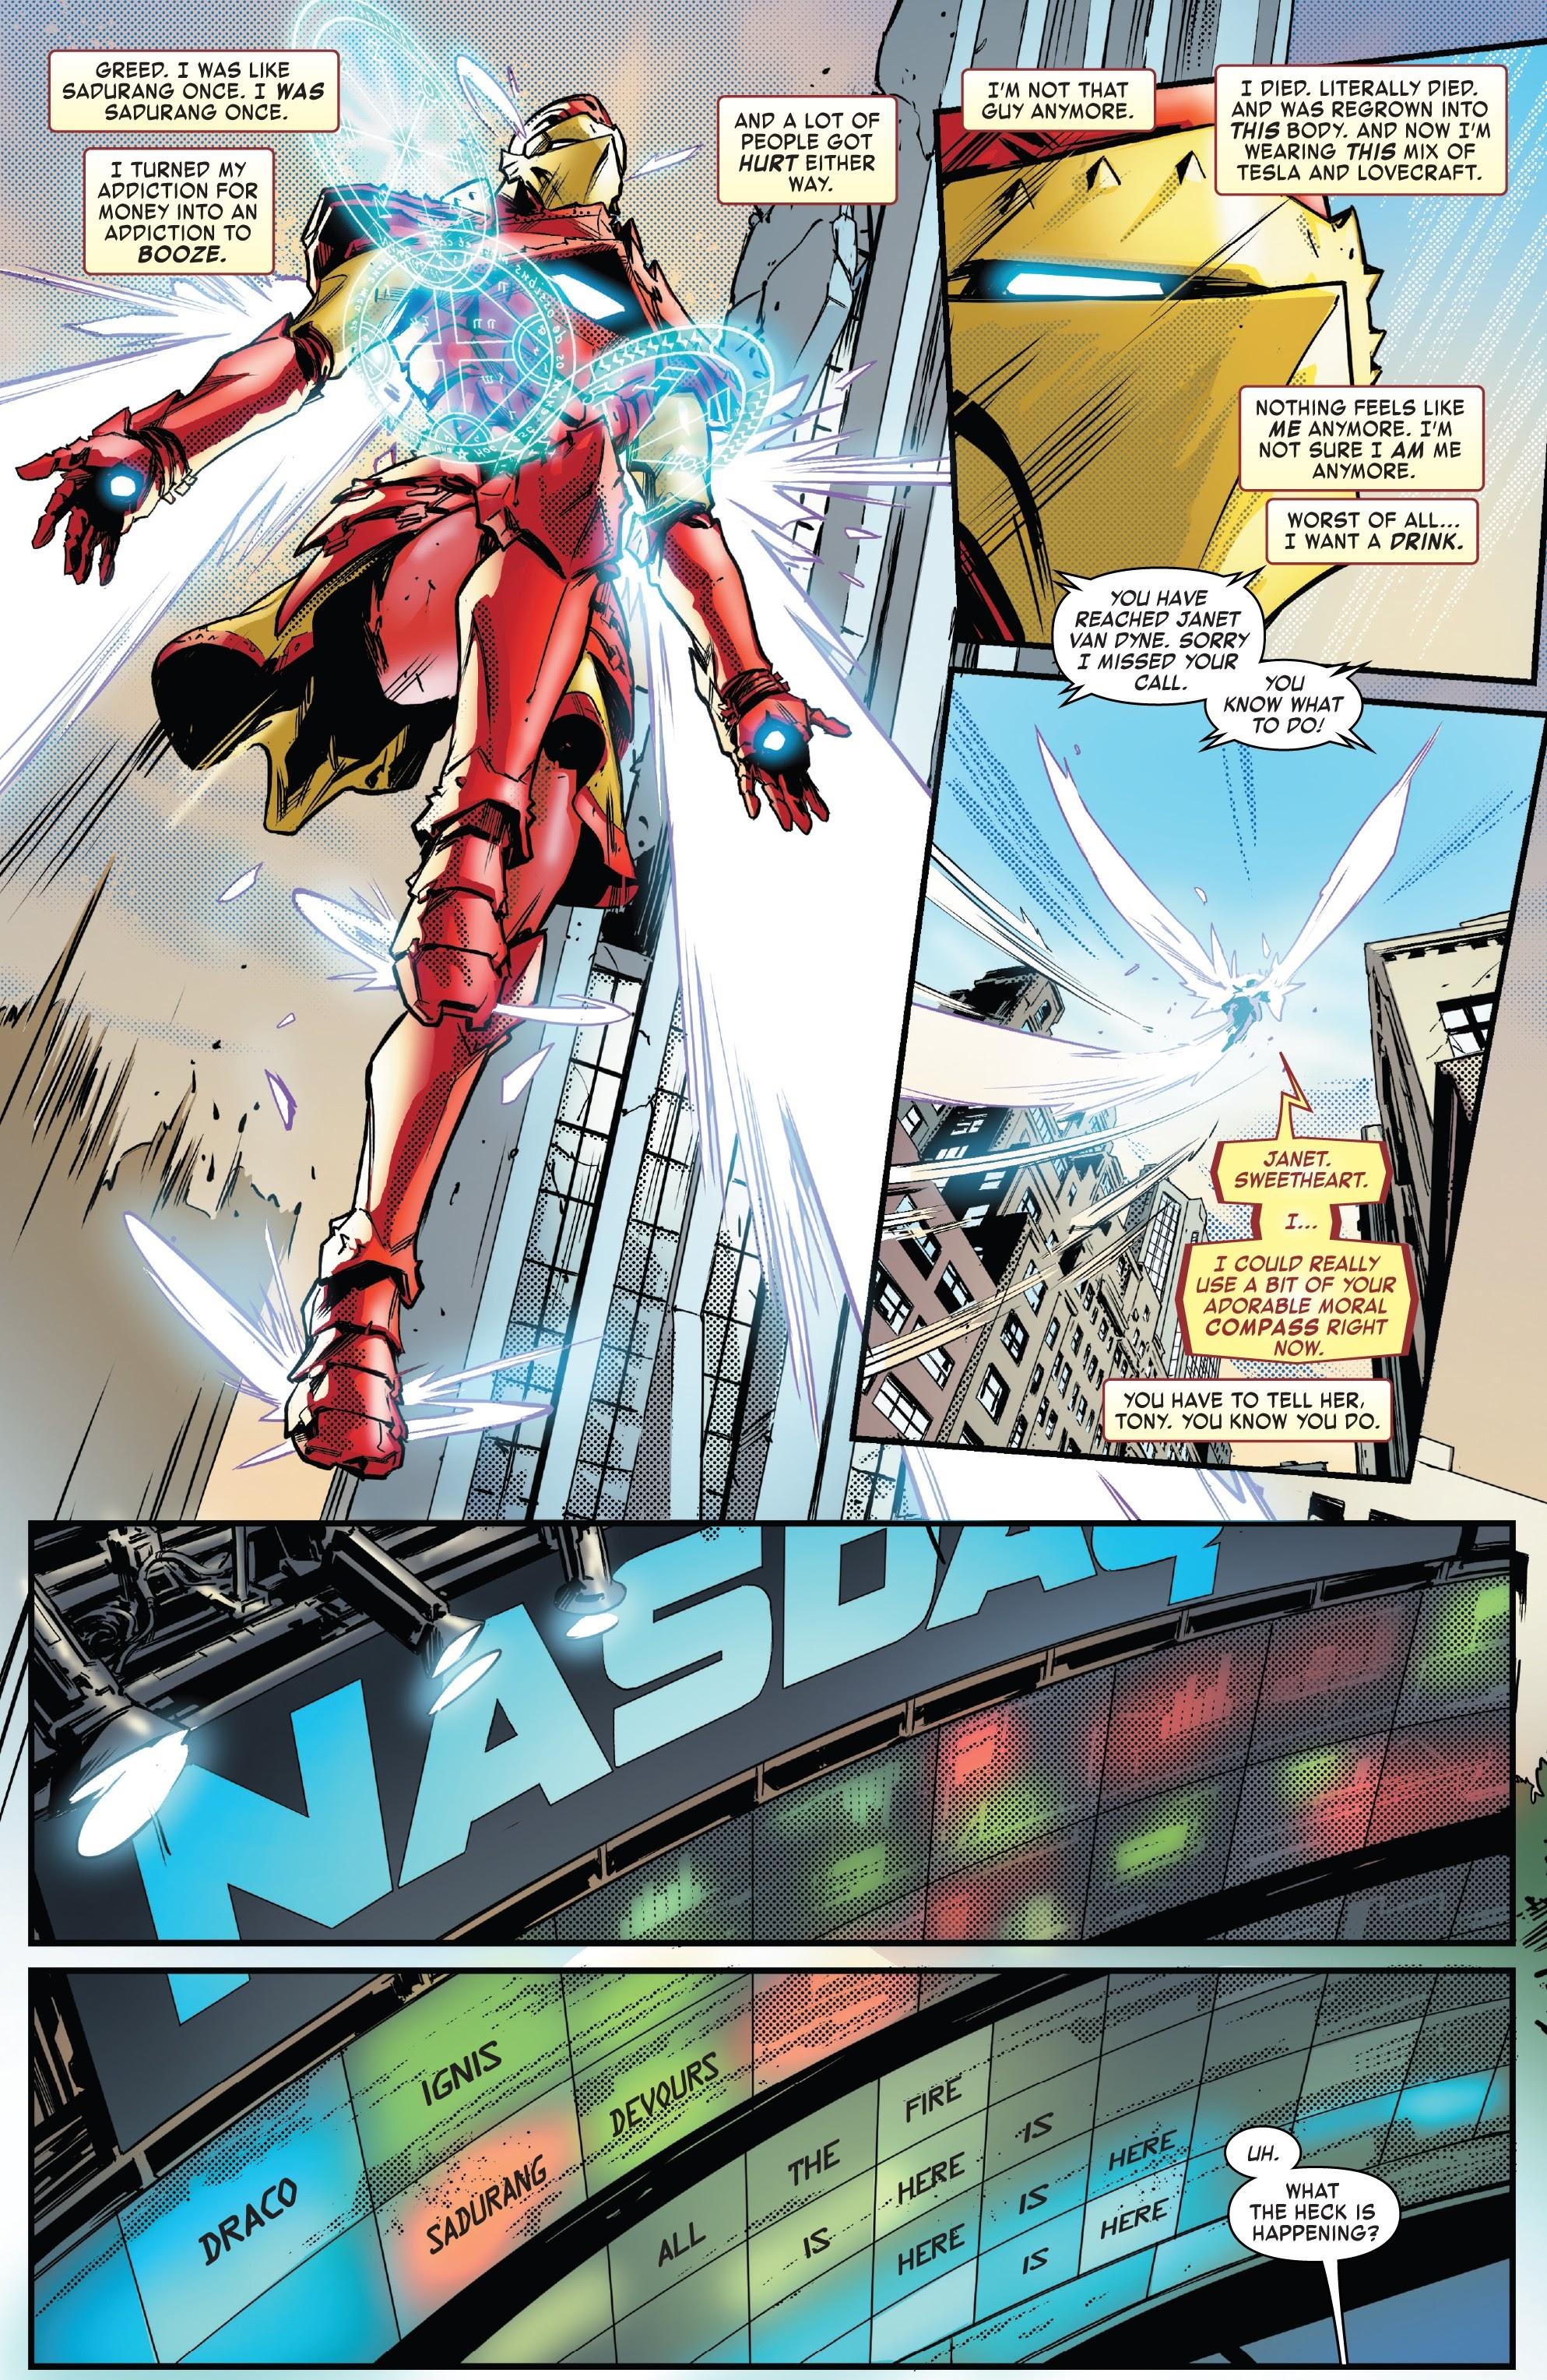 Read online Tony Stark: Iron Man comic -  Issue #13 - 9